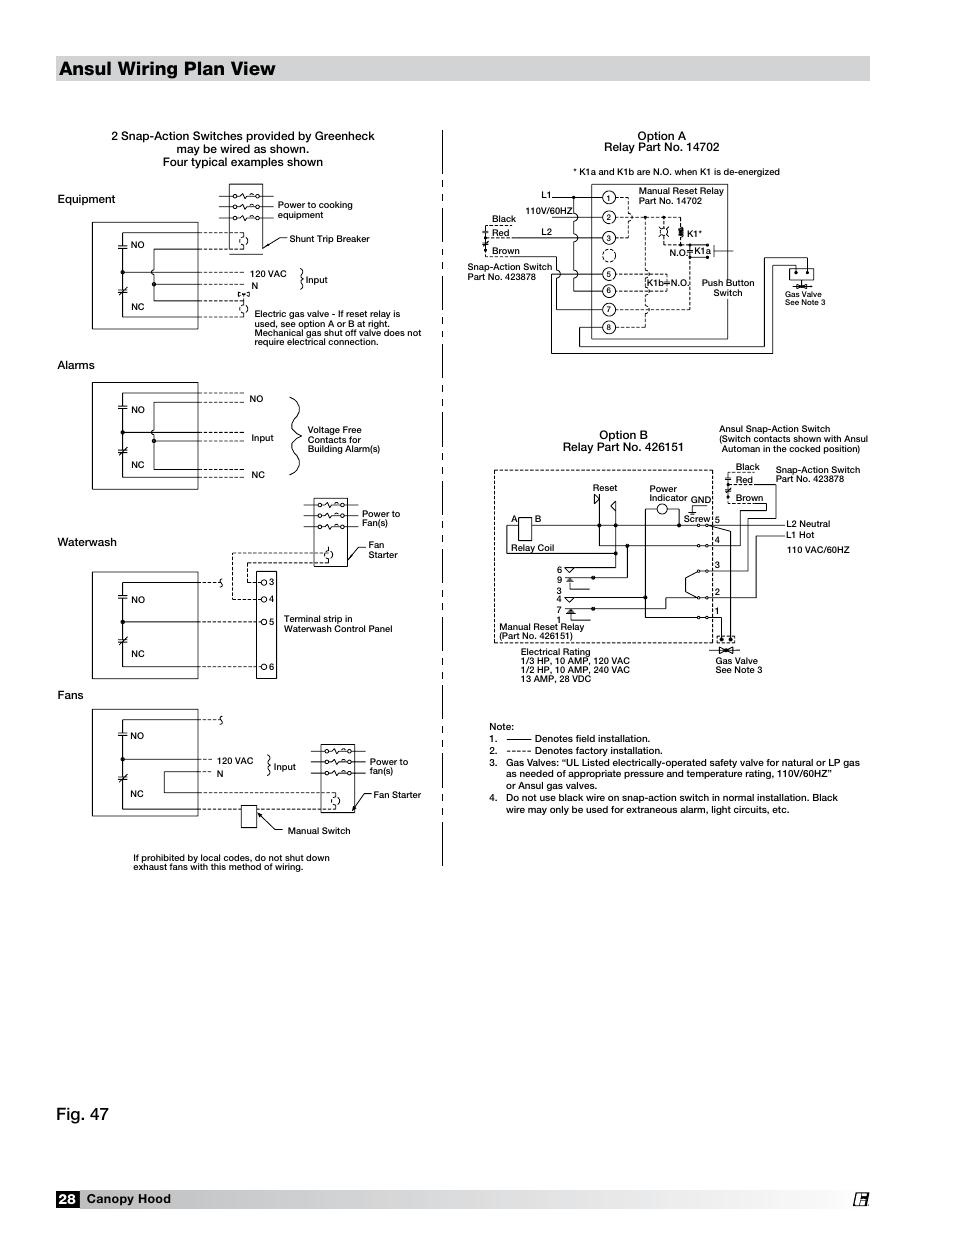 Robertshaw 9701i2 Wiring Diagram 32 Images Millivolt Breathtaking Gas Valve Pictures